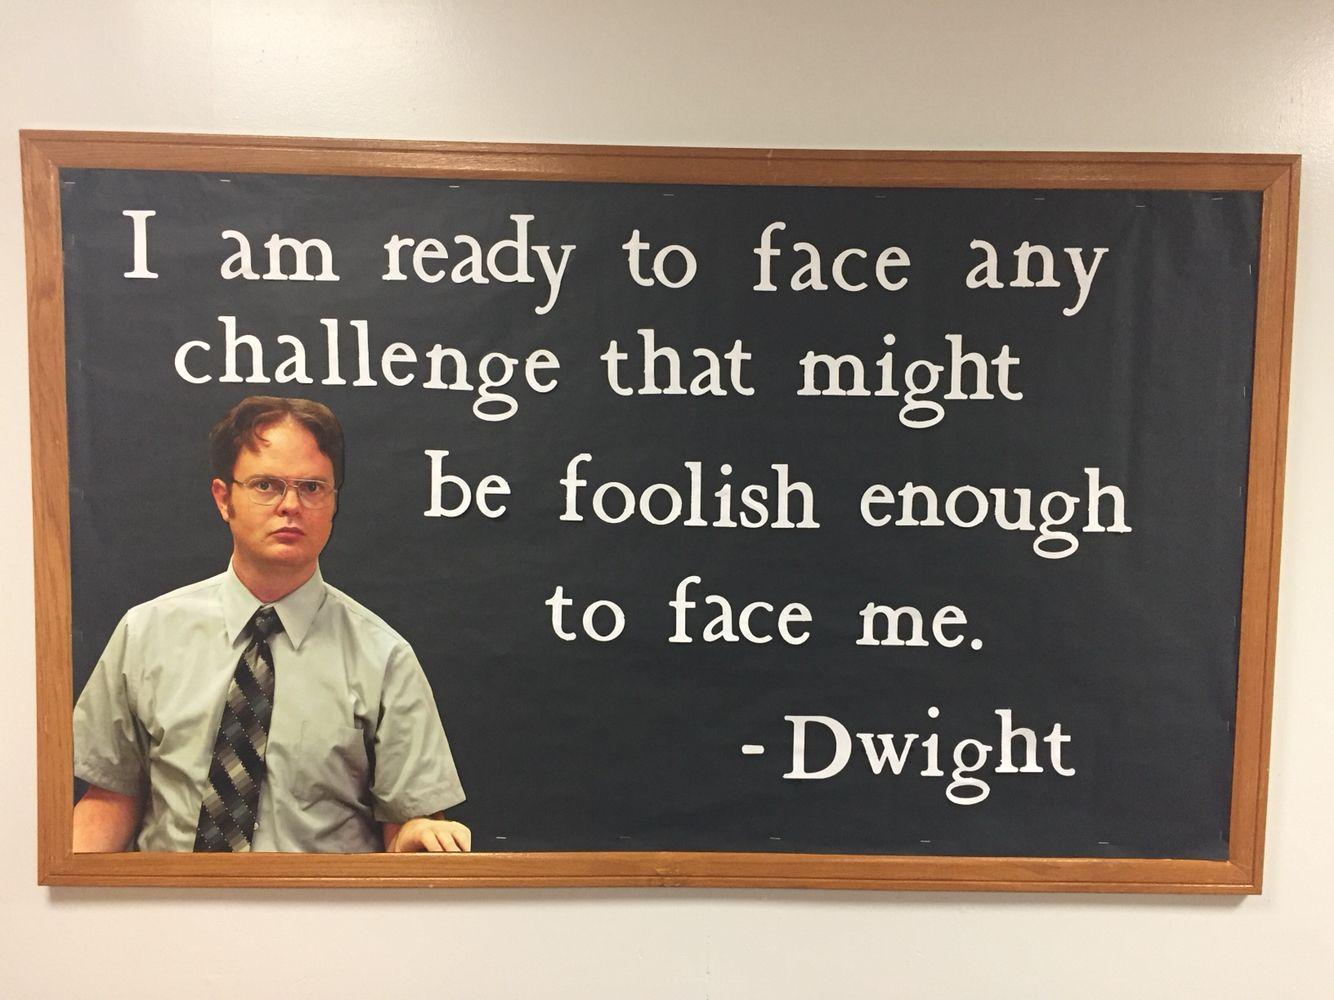 Old Office Dwight Quote Ra Bulletin Board Idea Office Dwight Quote Ra Bulletin Board Idea Ra Ideas School Senior Graduation Quotes School Senior Quotes Disney inspiration High School Senior Quotes